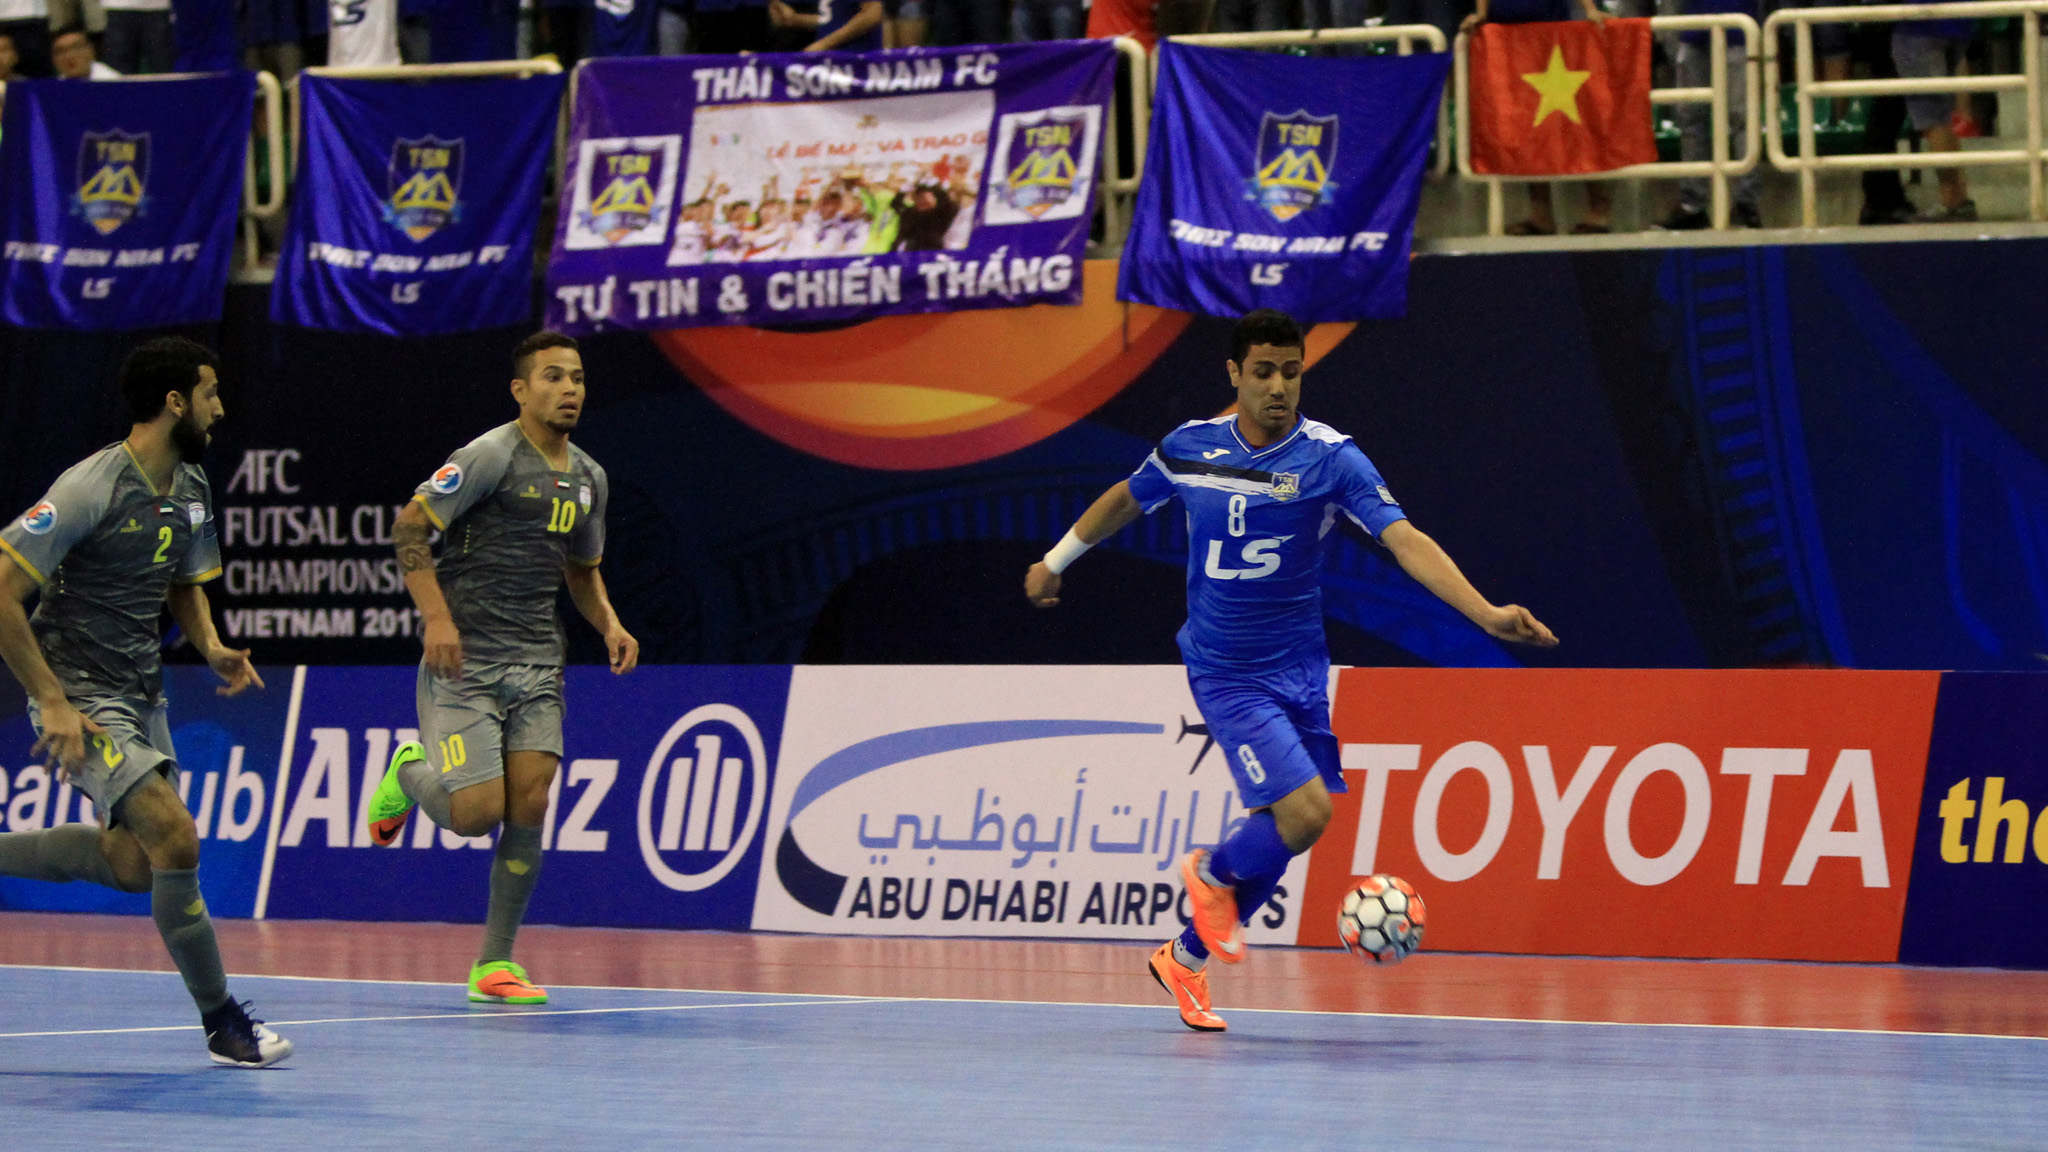 2017 AFC Futsal Club Championship   Thai Son Nam vs Al Dhafra